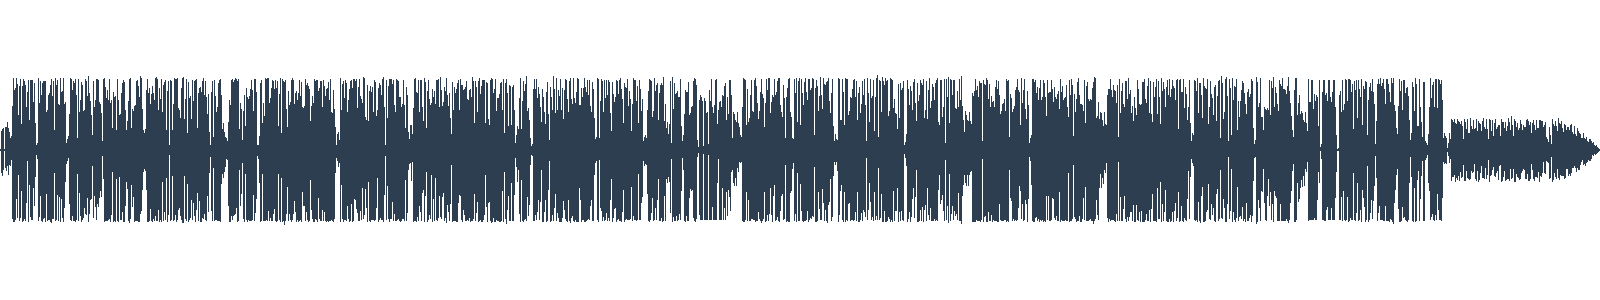 (2) WESTech Veľký comeback: BIG 5 waveform